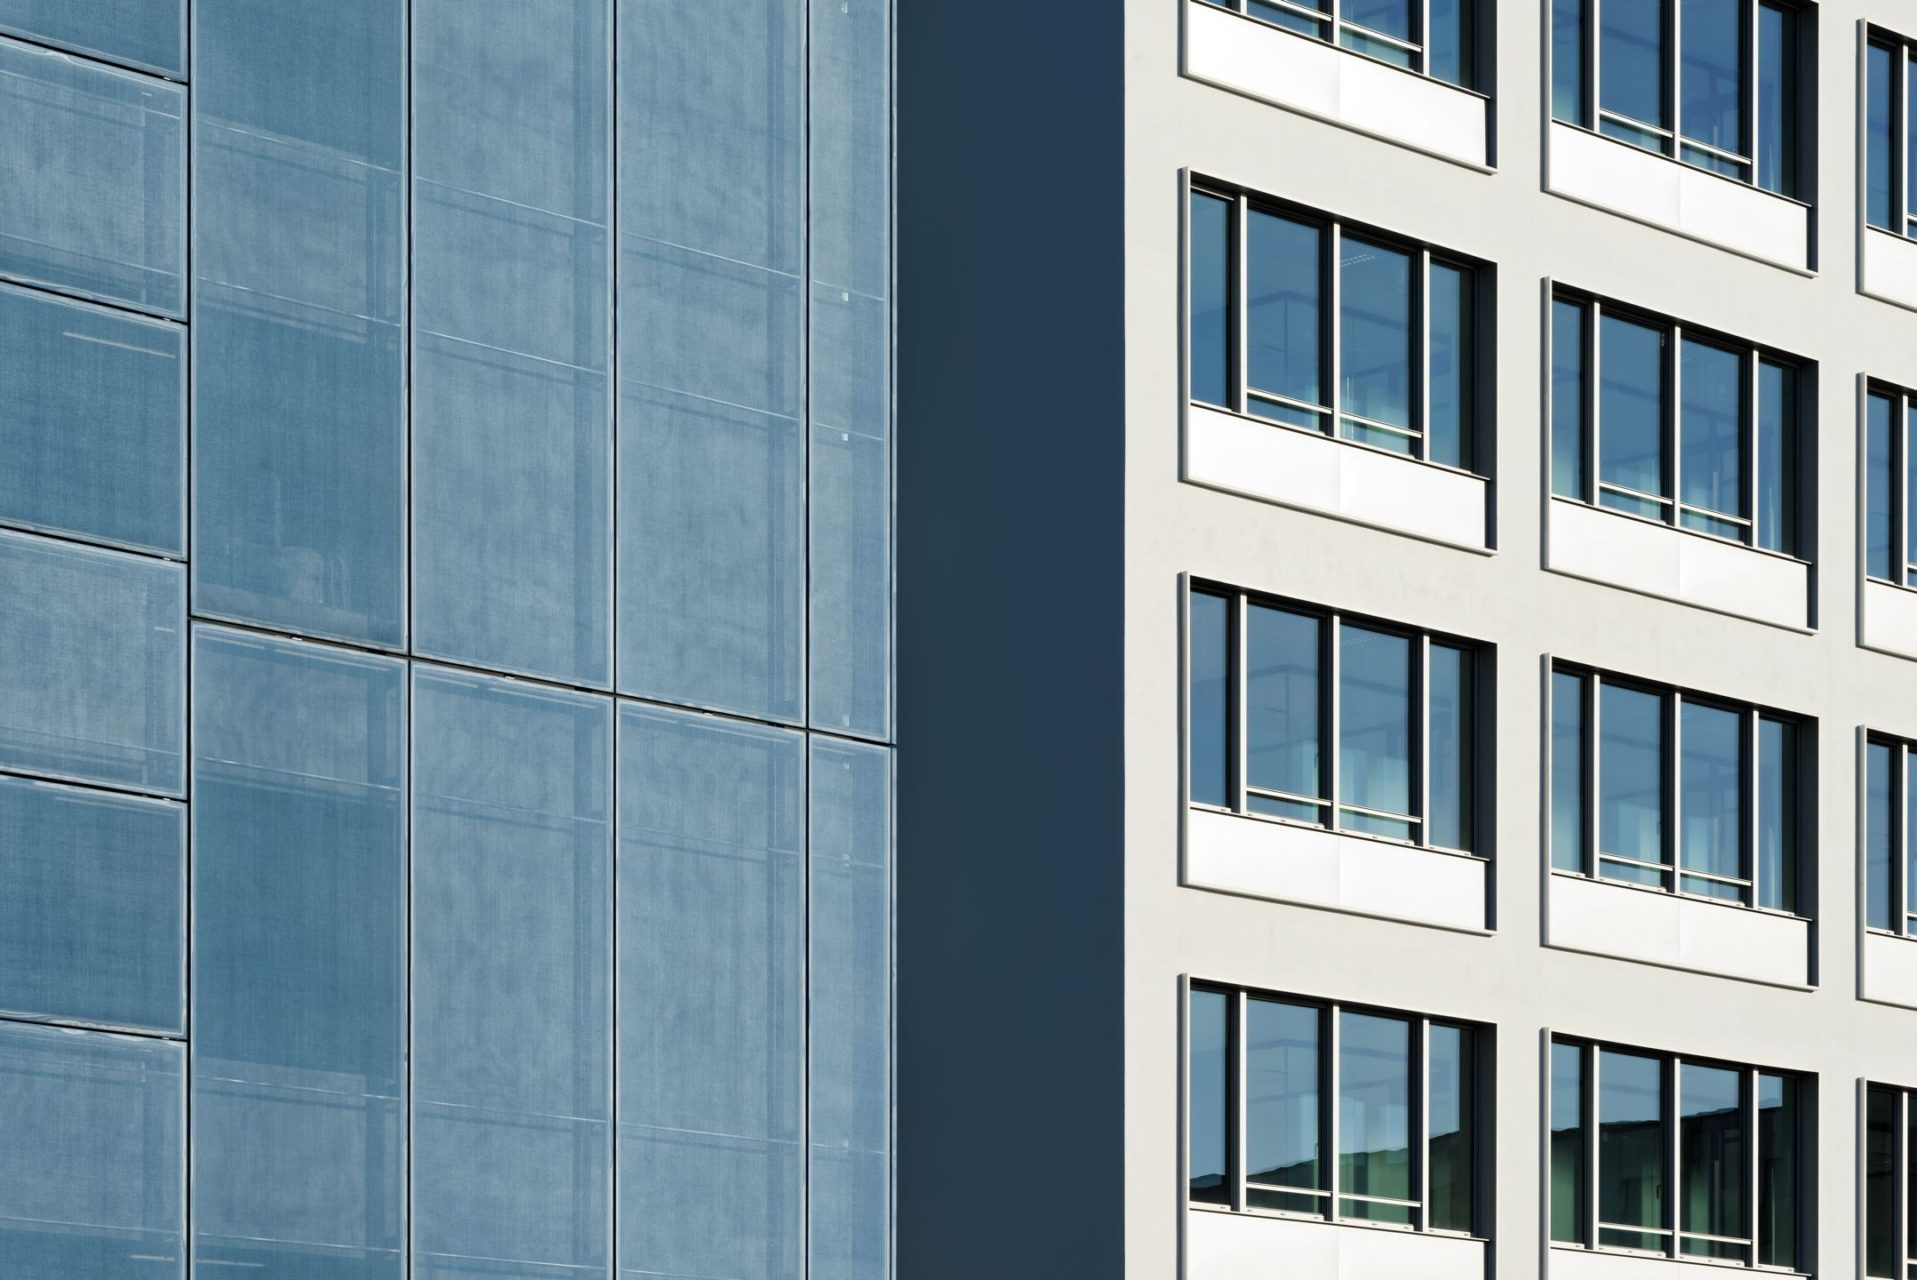 SAFRAN_facades et patios_22